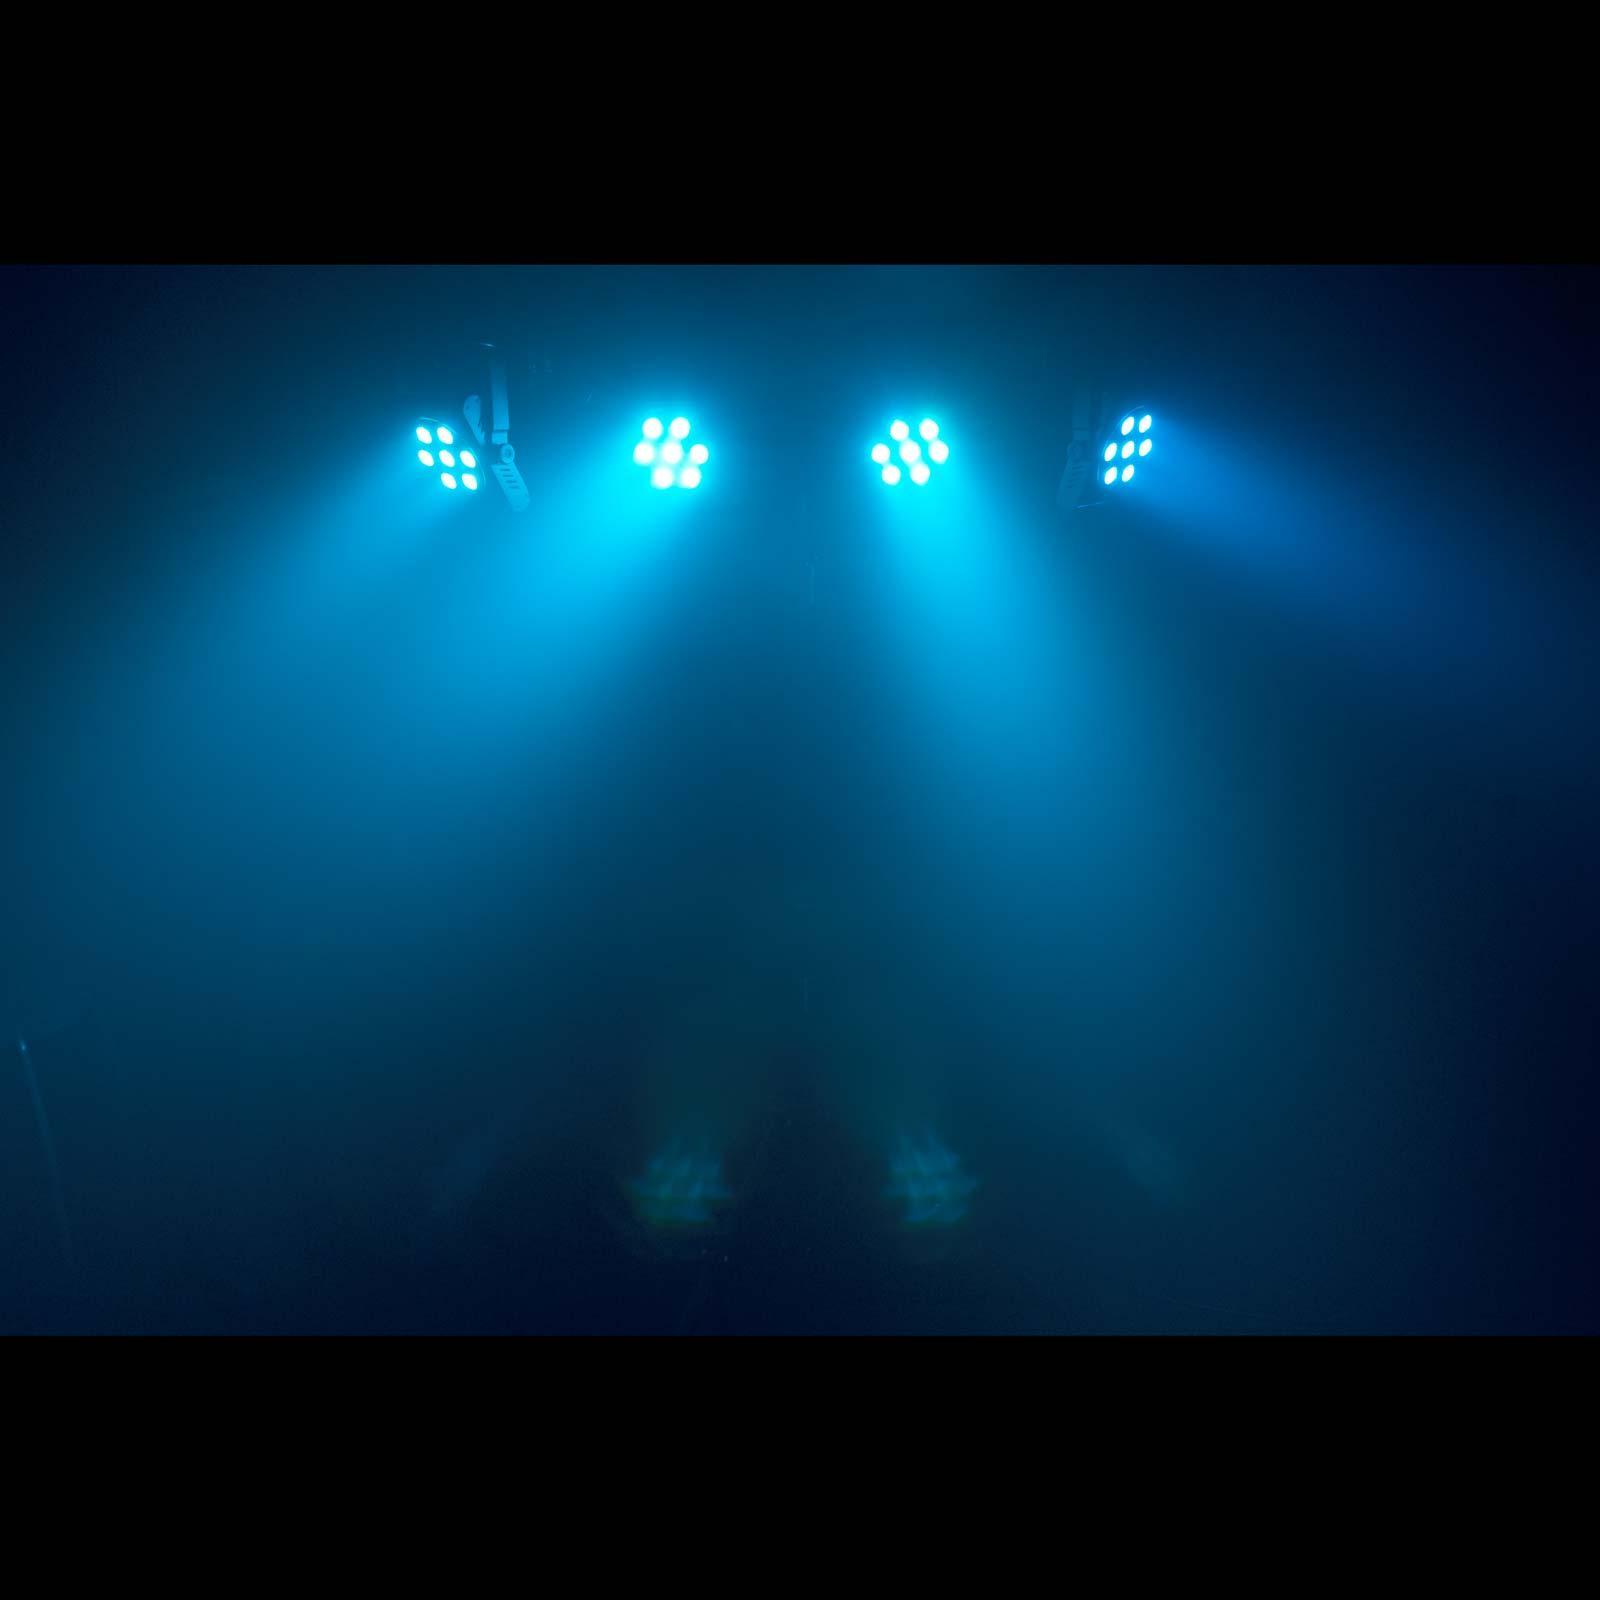 CHAUVET DJ 4BAR TRI USB Portable Wirelesss DMX LED Wash Lighting System  sc 1 st  Agiprodj & CHAUVET DJ 4BAR TRI USB | Portable Wirelesss DMX LED Wash Lighting ...